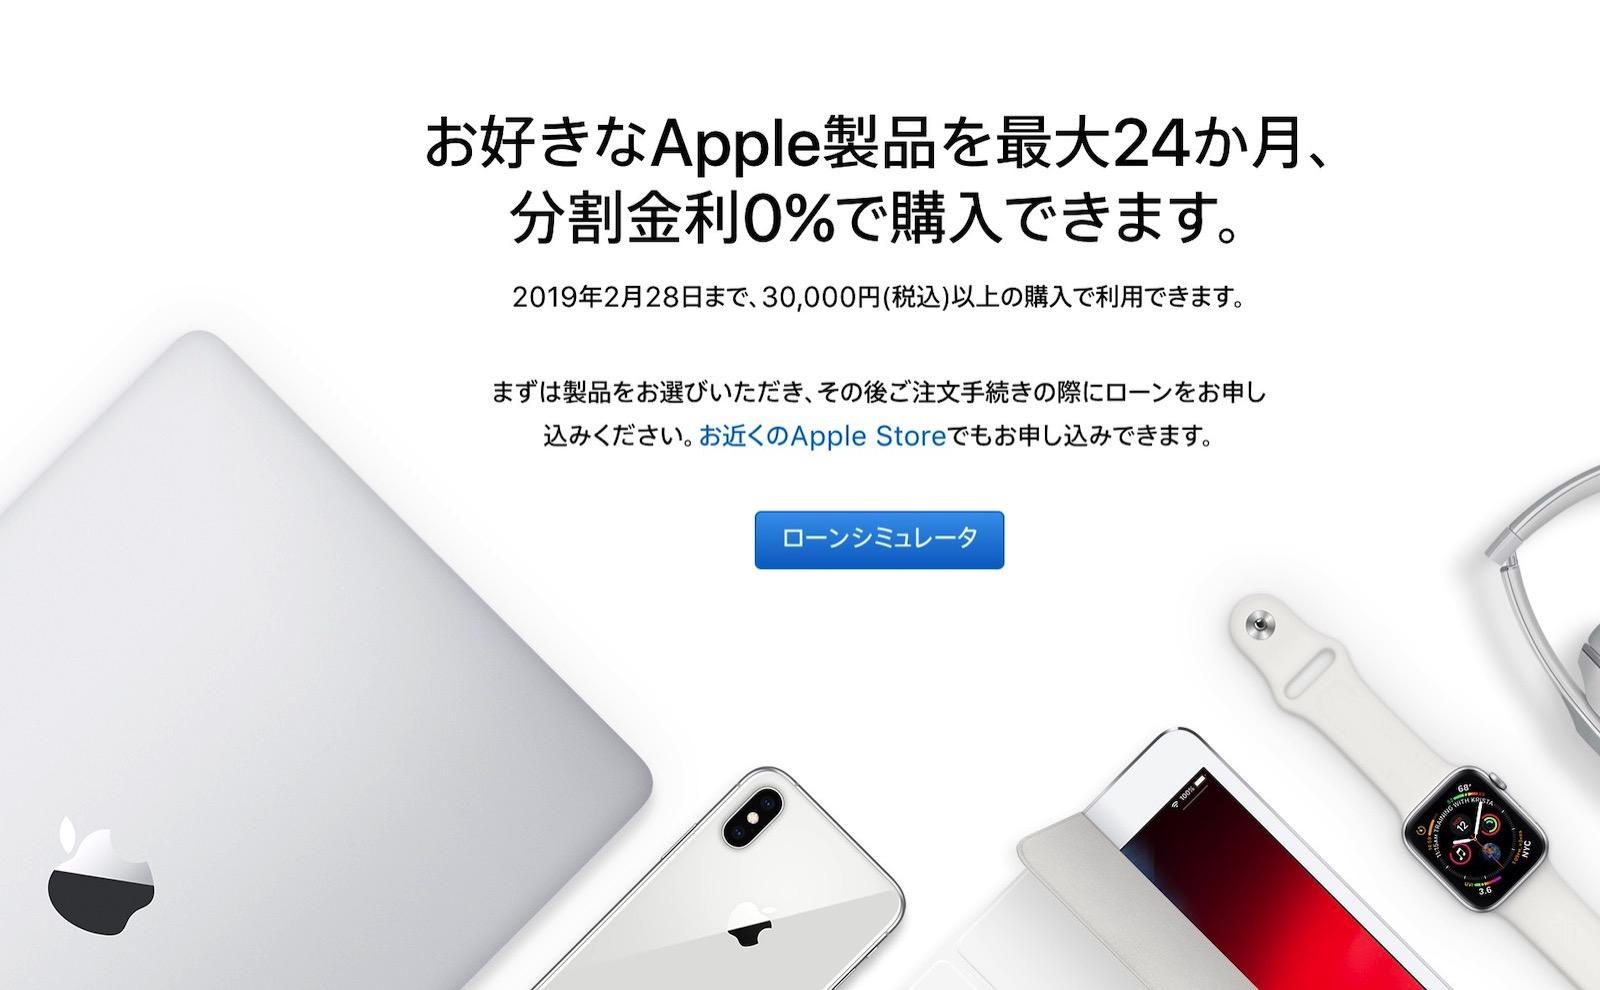 Apple Shopping Loan Financing 20190129